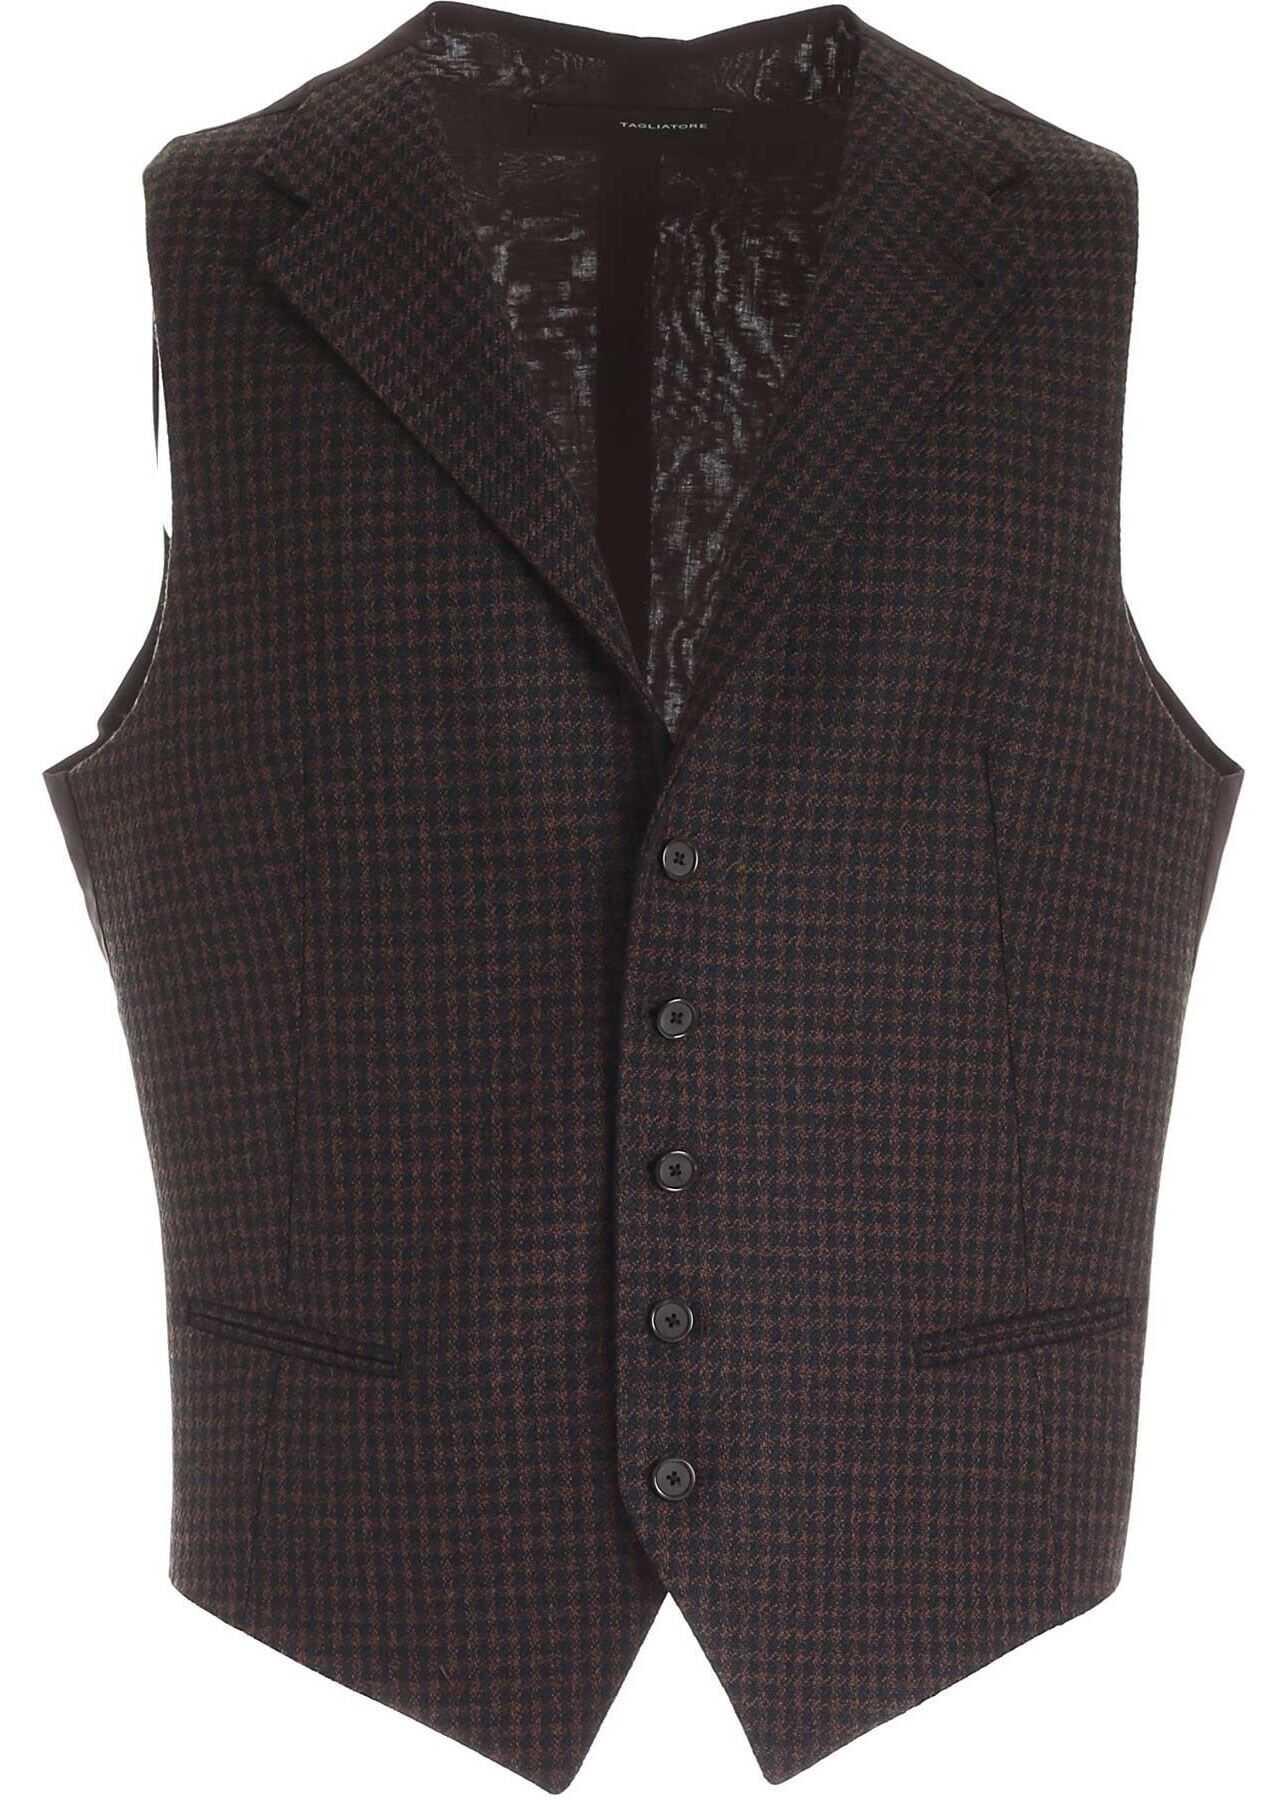 Tagliatore Checked Pattern Dennis Vest In Brown And Black Black imagine